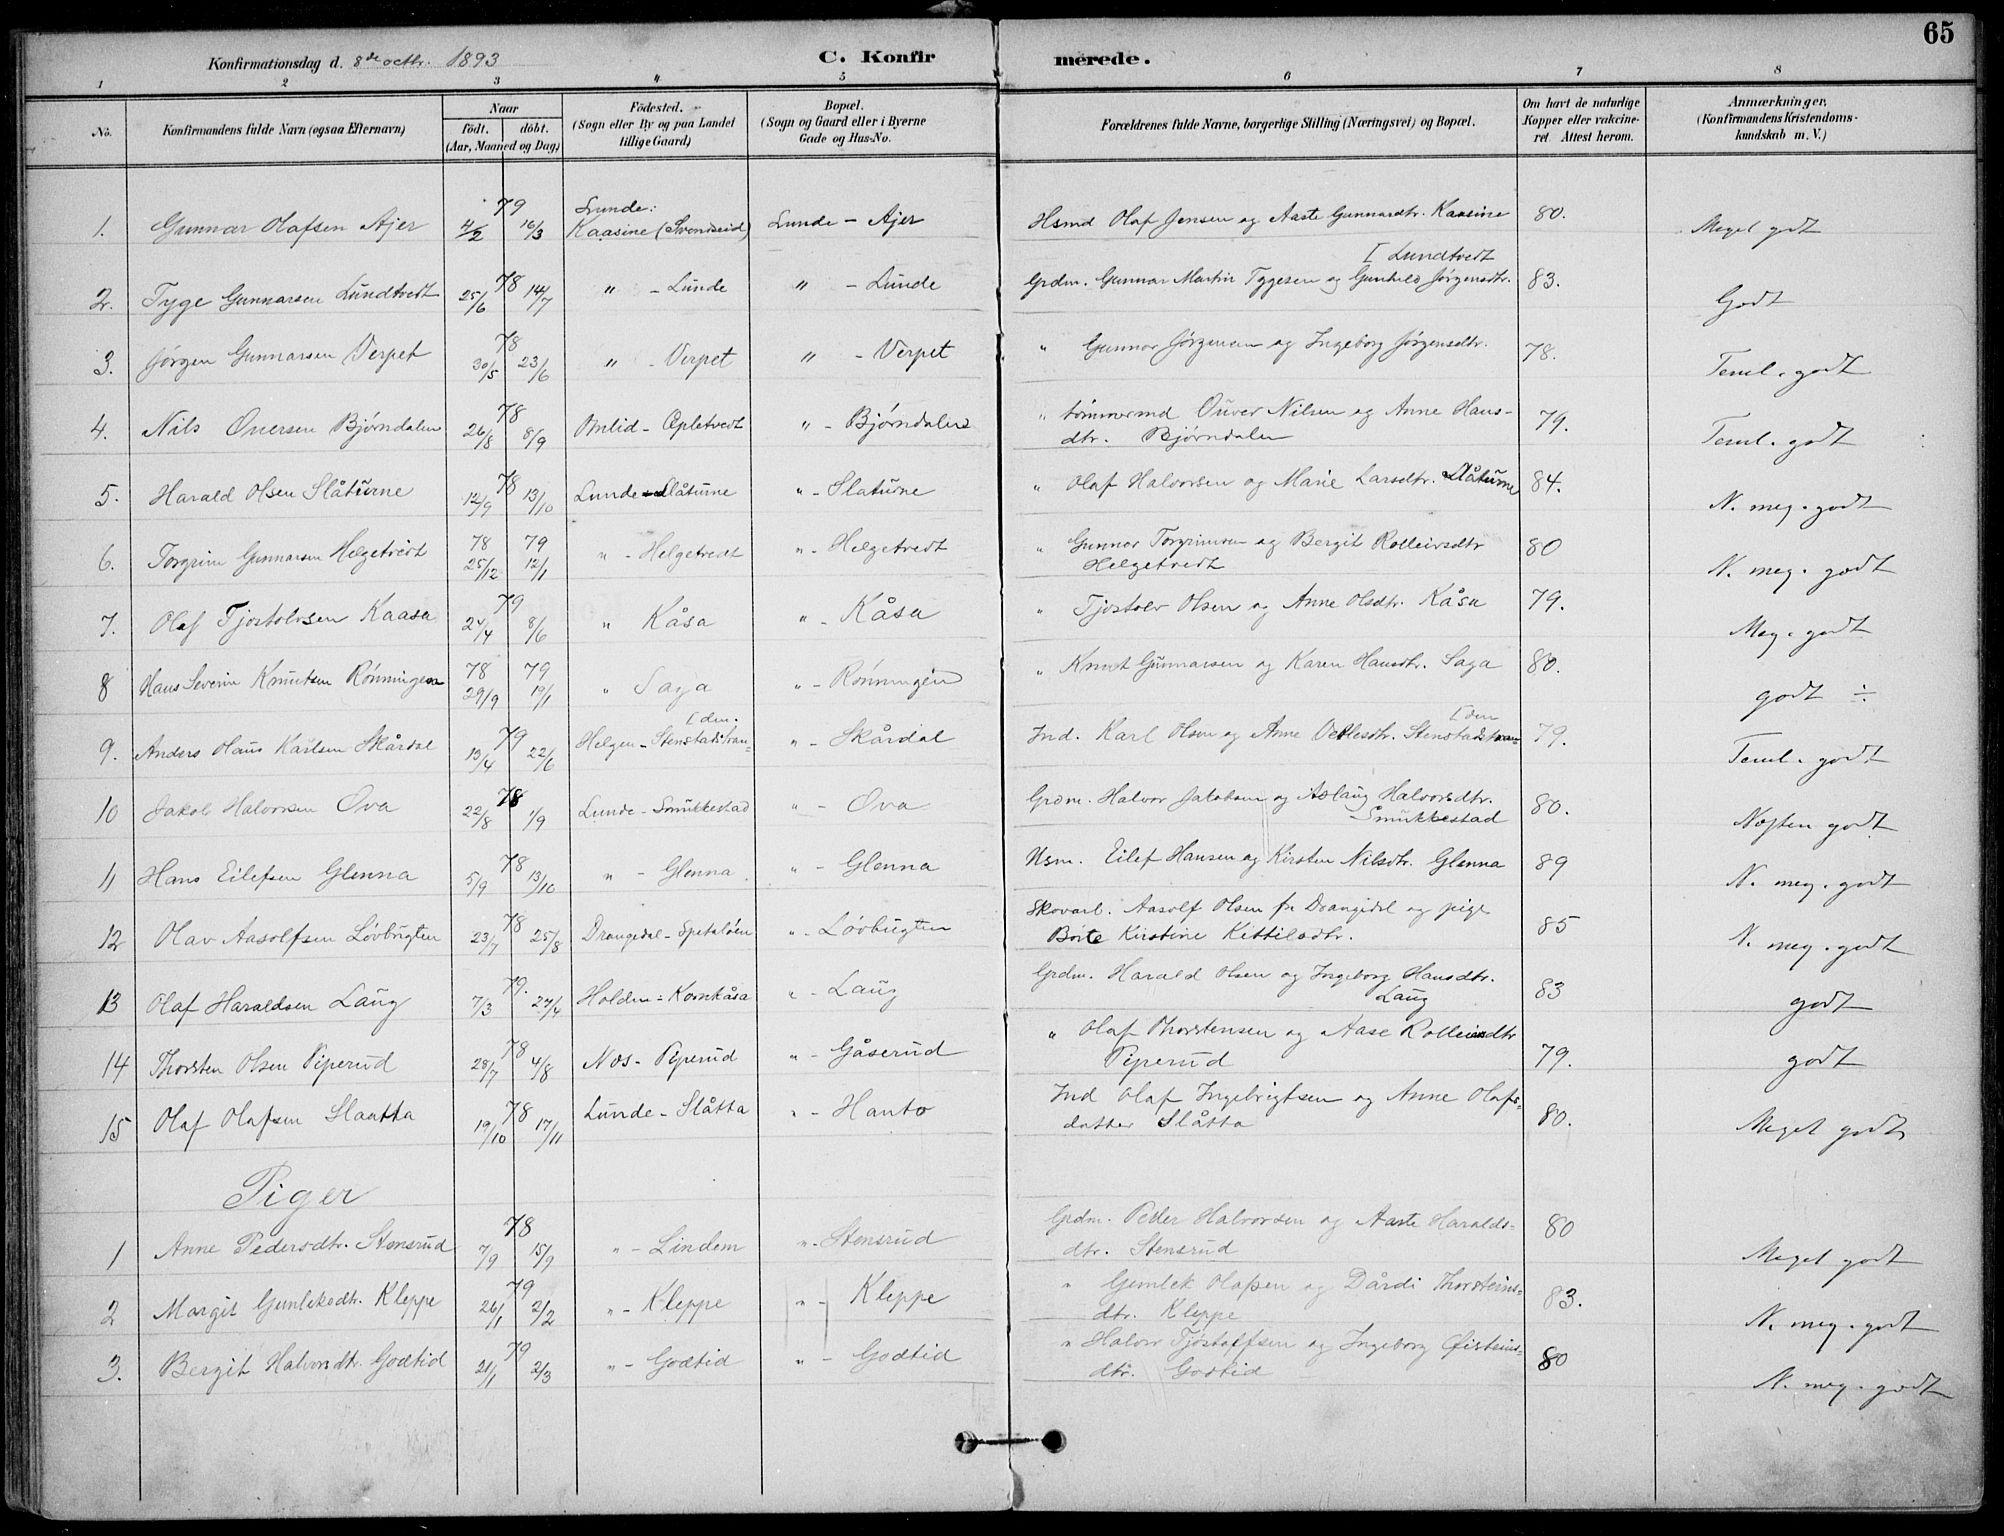 SAKO, Lunde kirkebøker, F/Fa/L0003: Ministerialbok nr. I 3, 1893-1902, s. 65